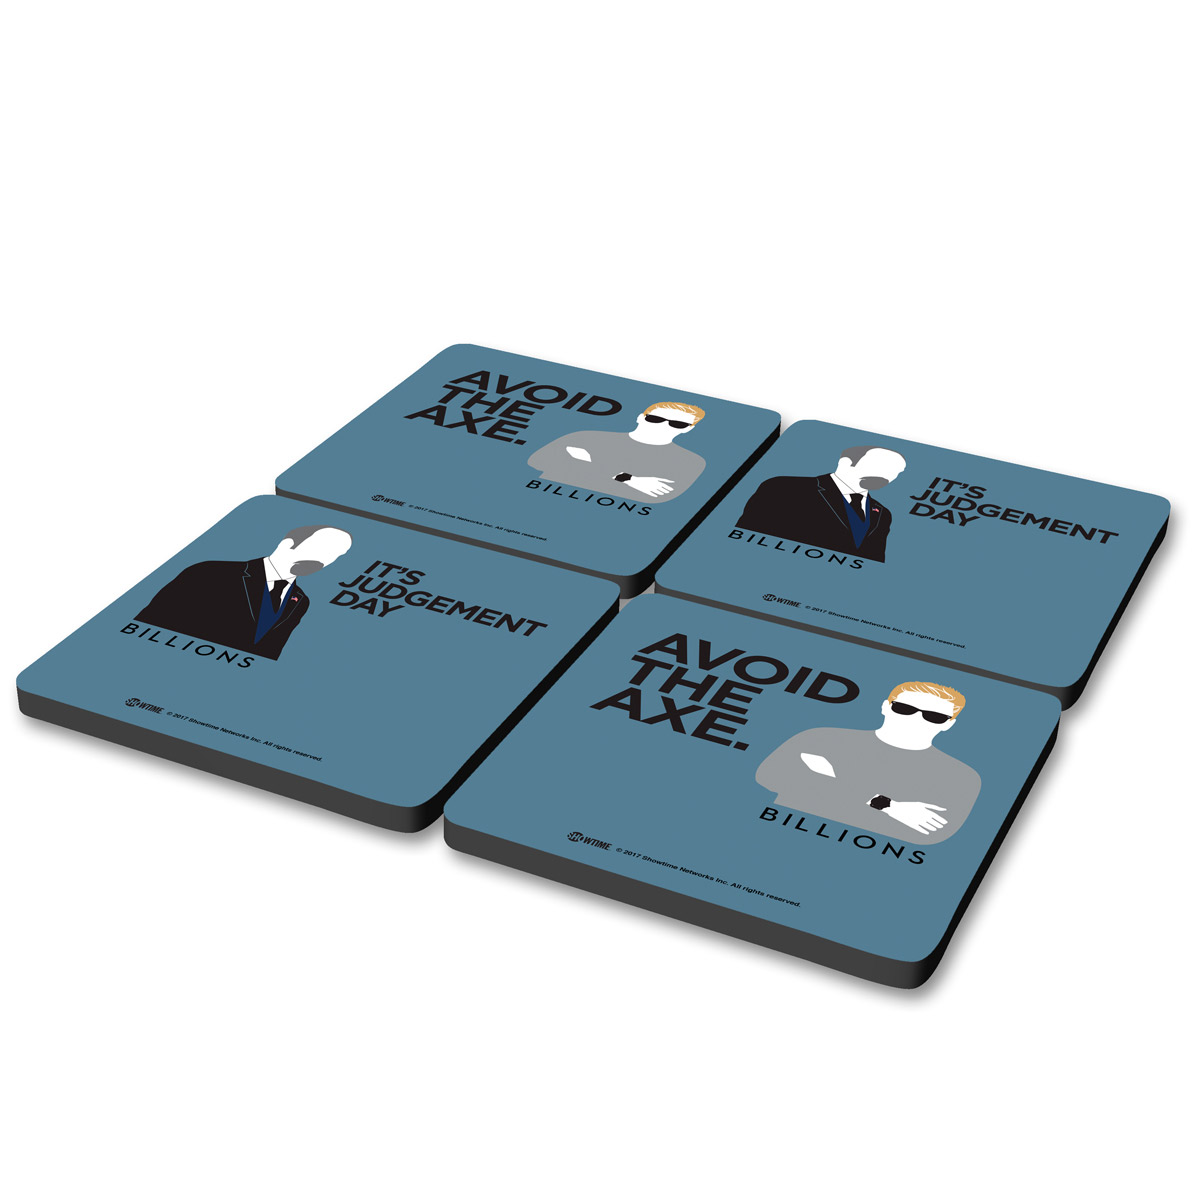 Billions Axe and Rhoades Coaster Set [Set of 4]